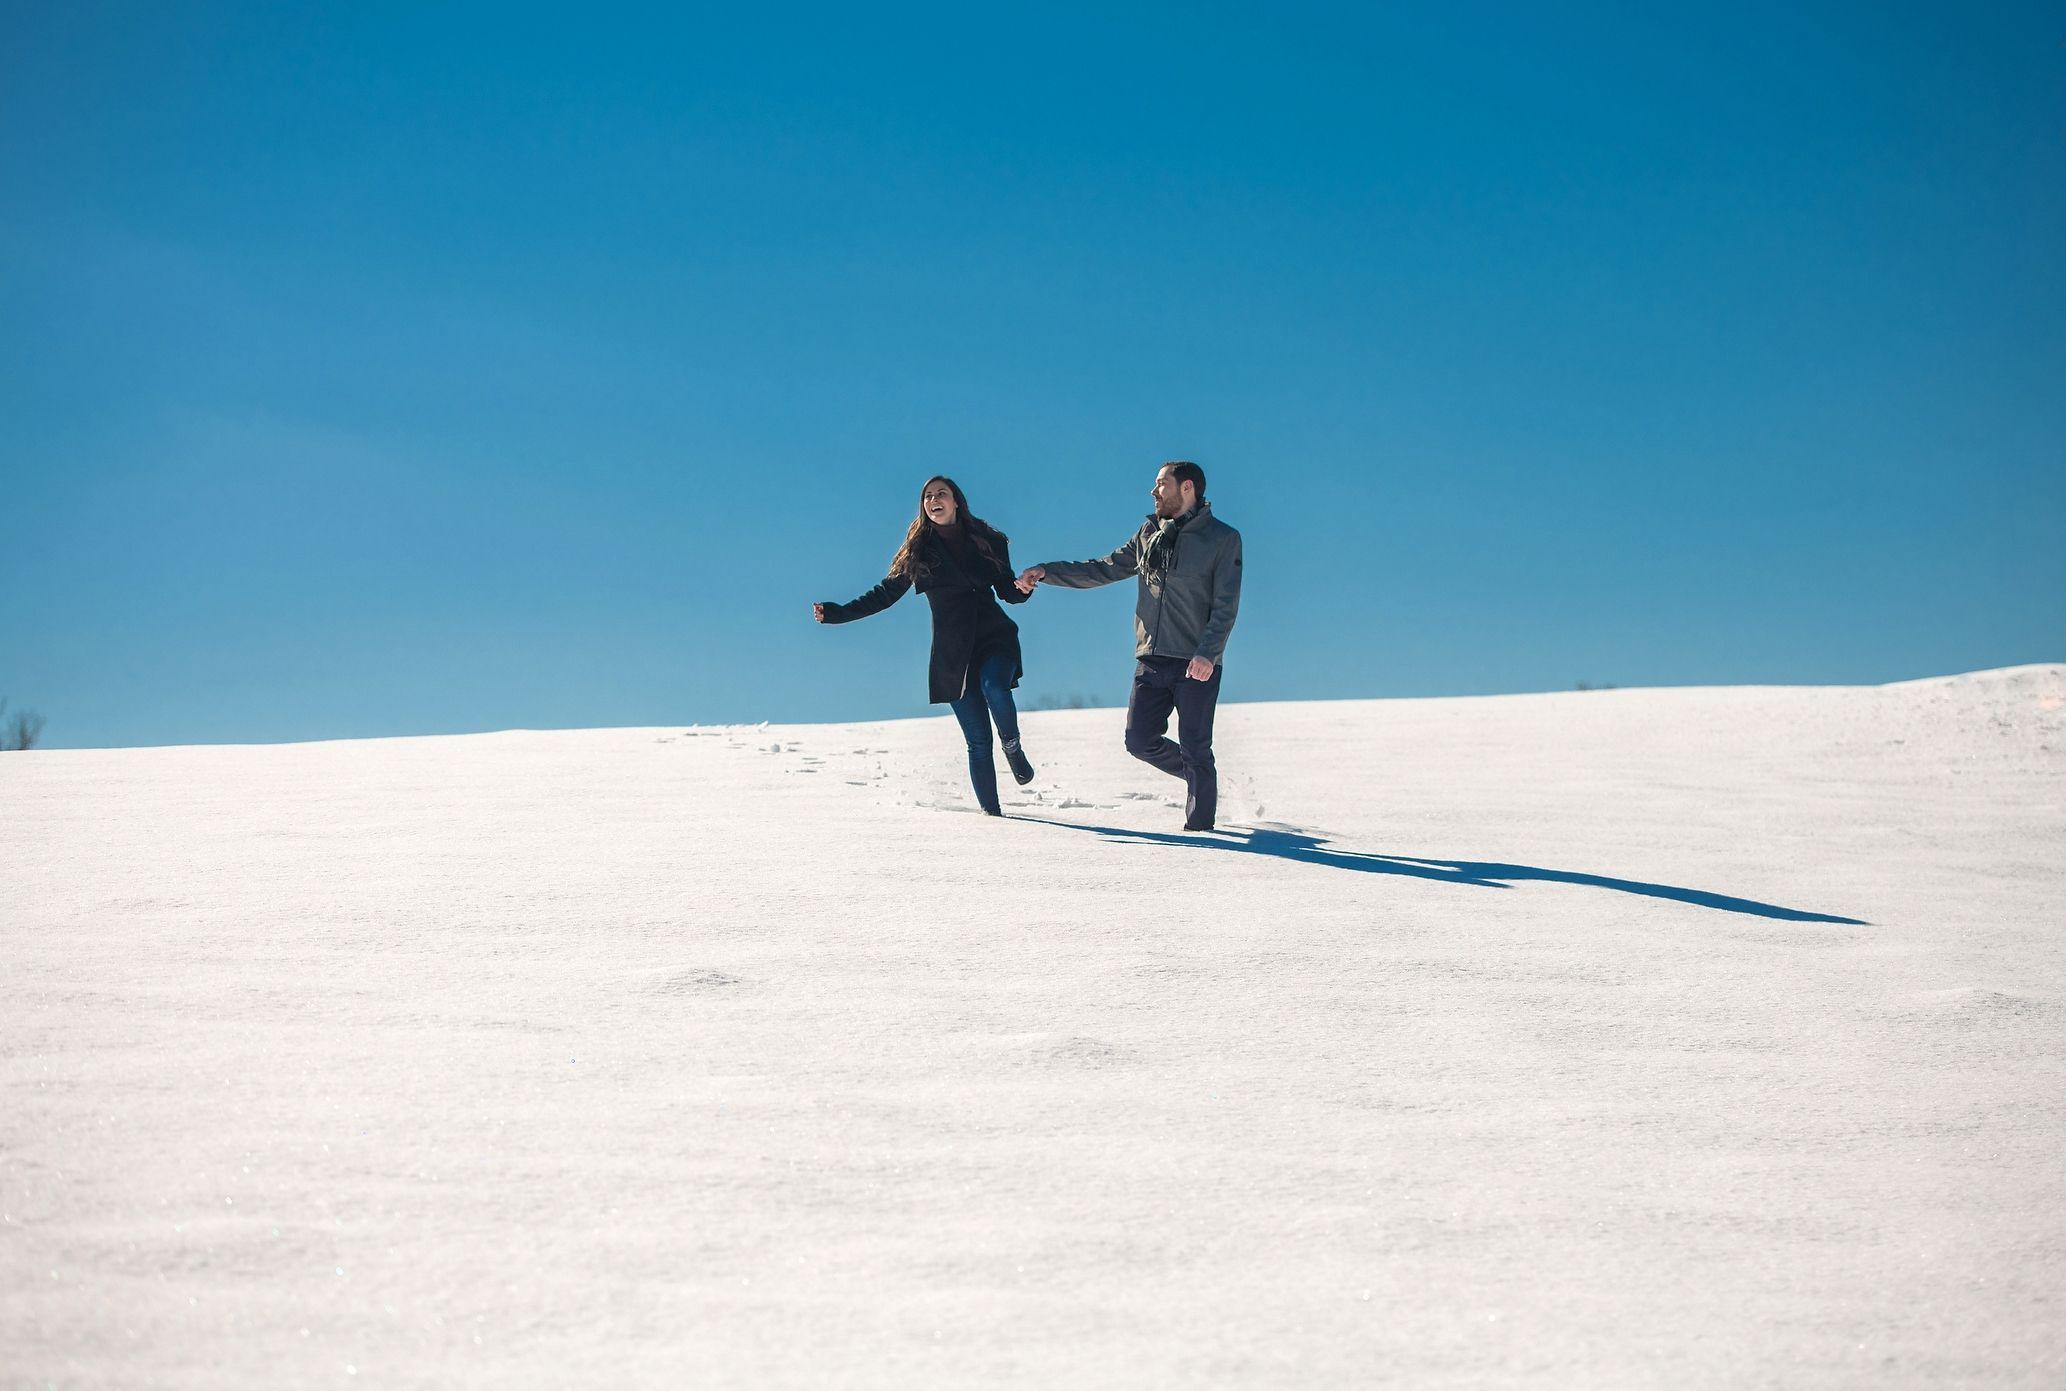 Shapera, SnowyFields, Engagement.jpg